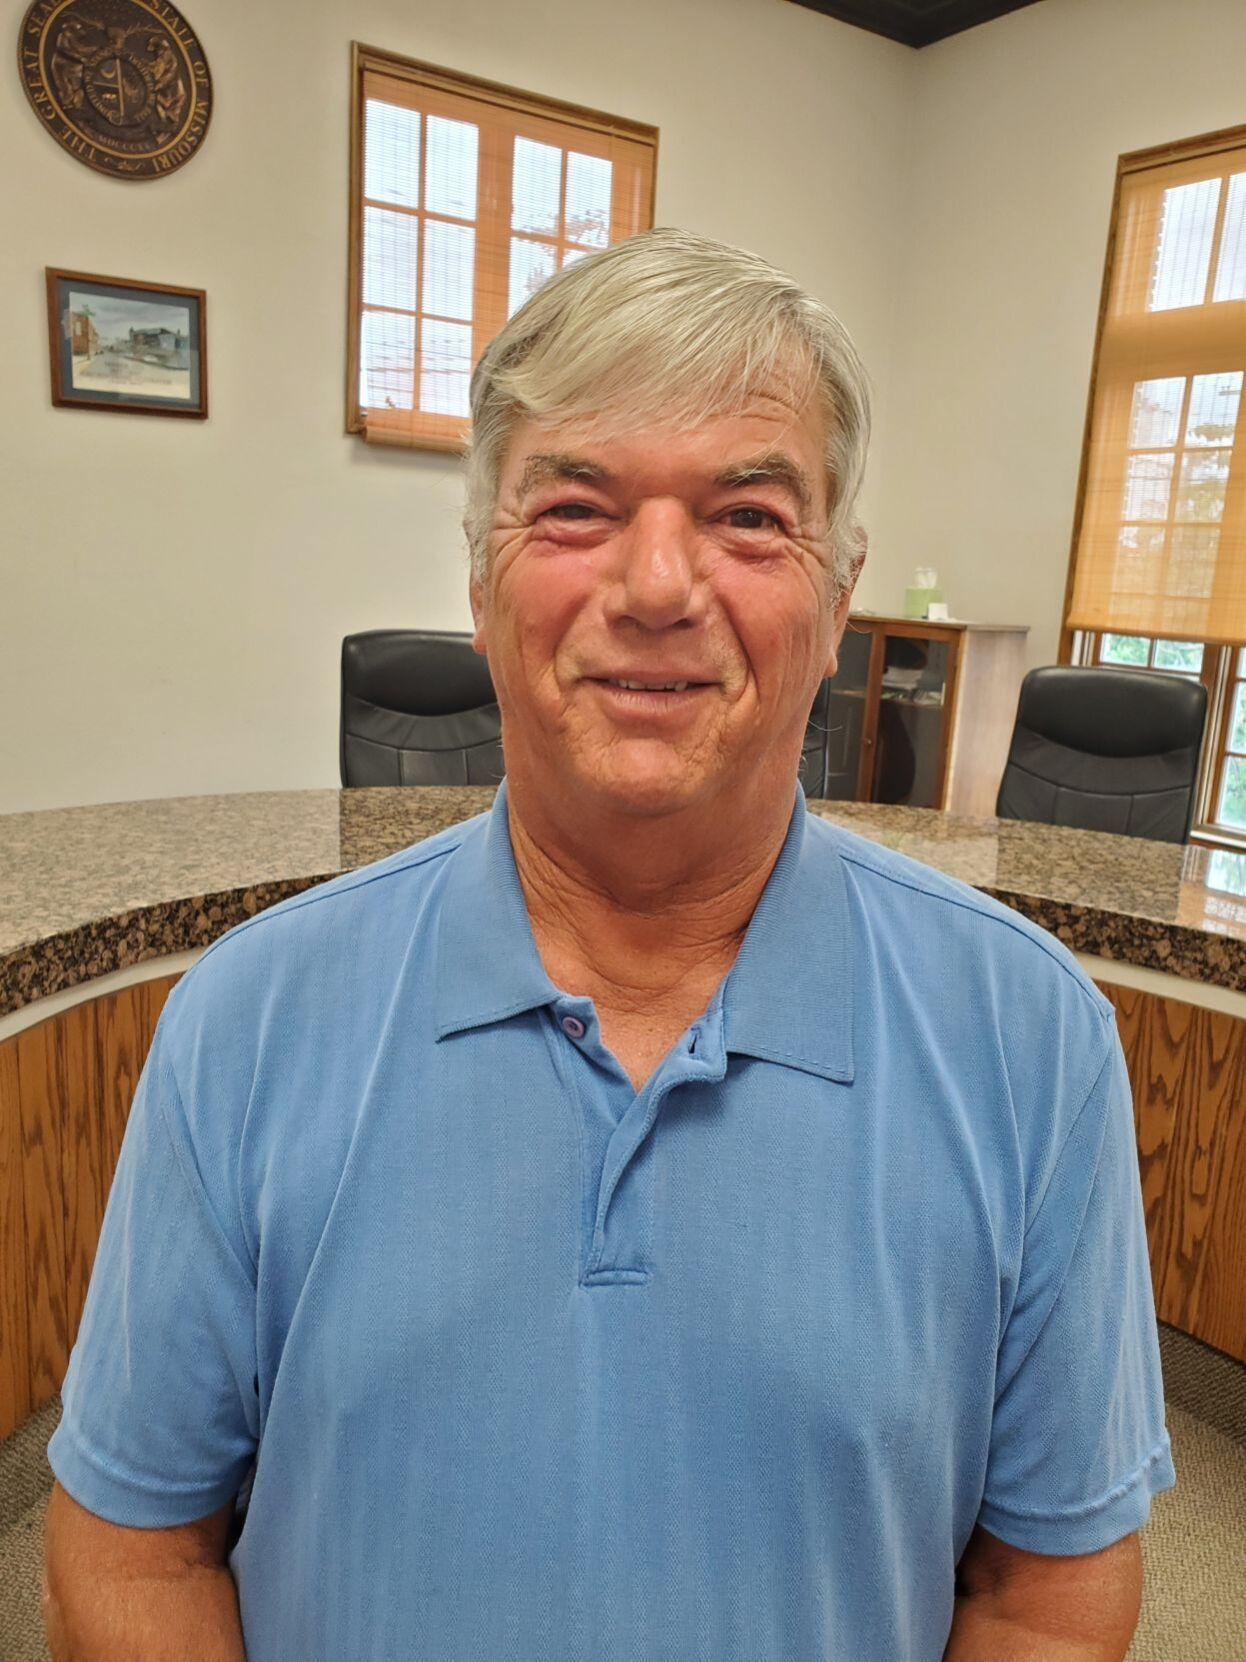 Monroe City alderman, mayor continue feud after alleged DWI